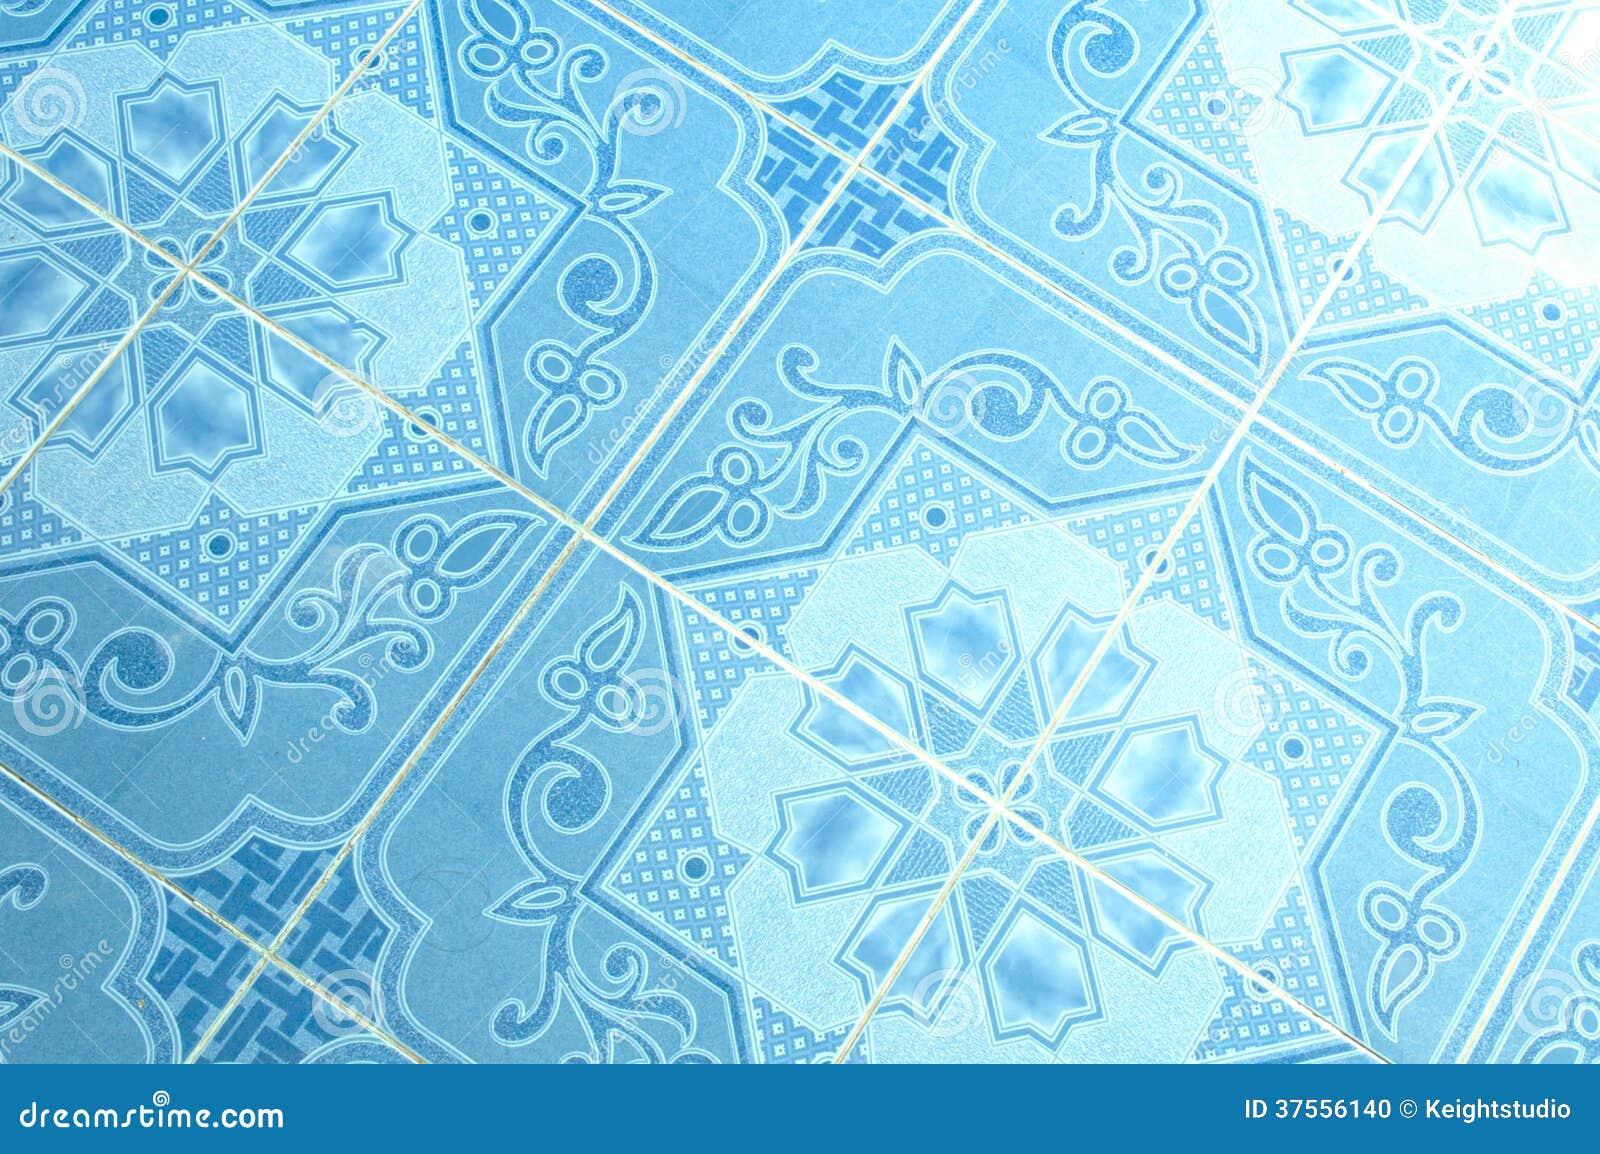 kitchen blue tiles texture. Eamless Blue Tiles Texture Background Kitchen T